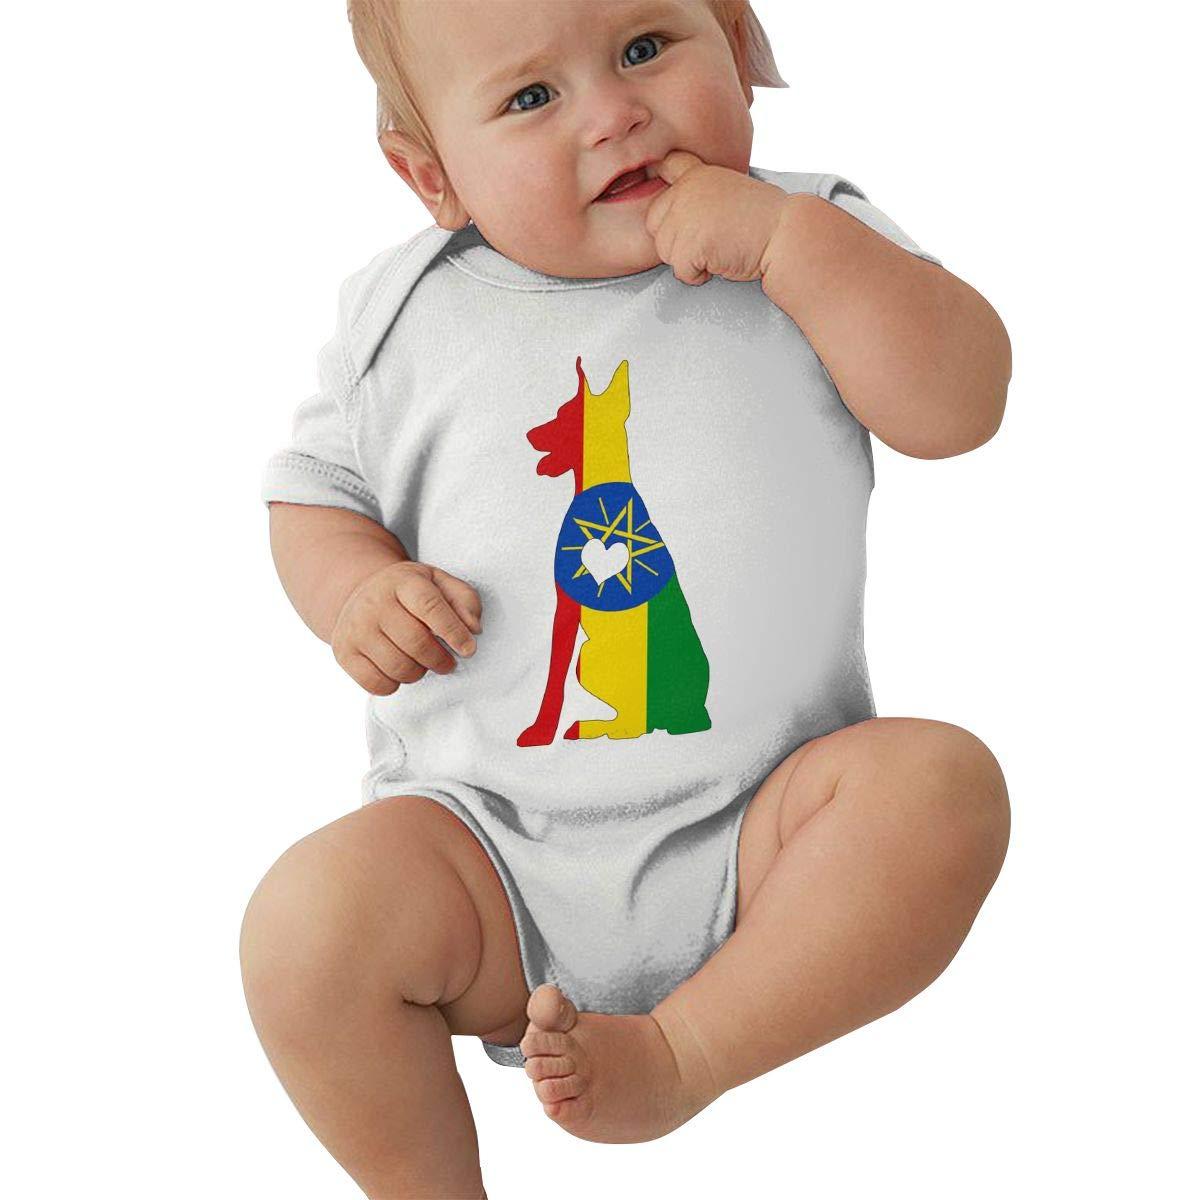 Mri-le2 Baby Boy Short Sleeve Organic Bodysuit Ethiopia Flag Adore Dobermans Dog Toddler Jumpsuit